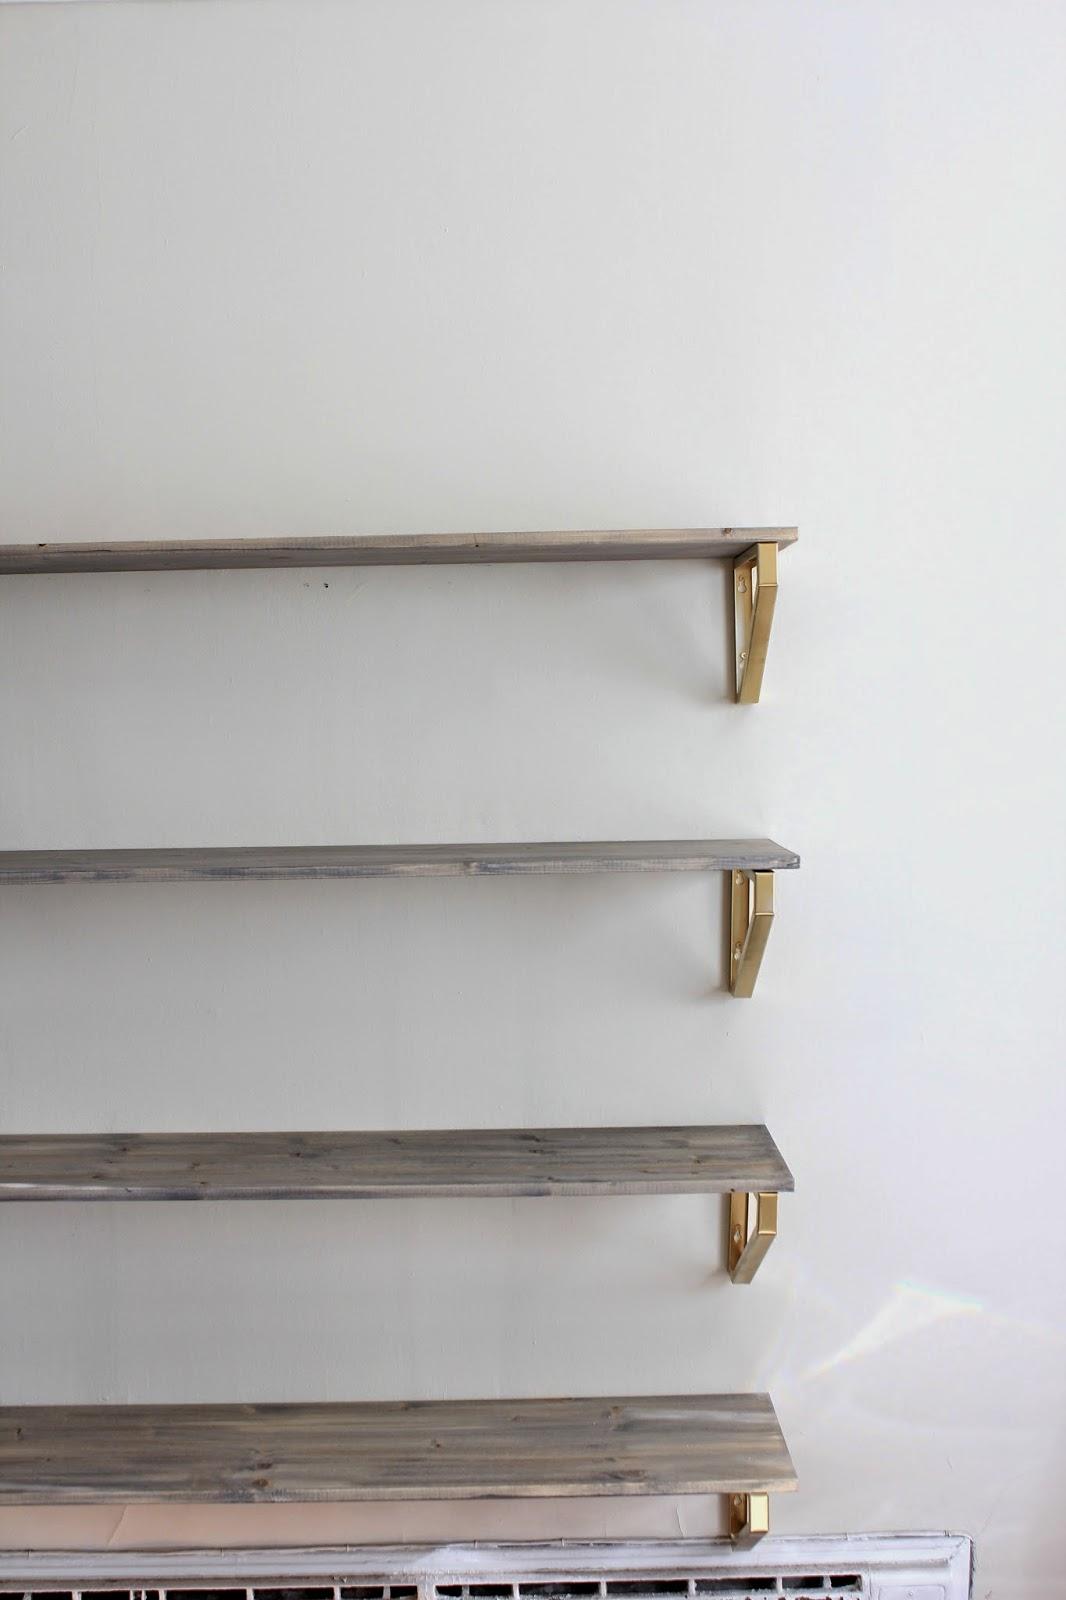 Cup Half Full Rustic Wood Shelf DIY